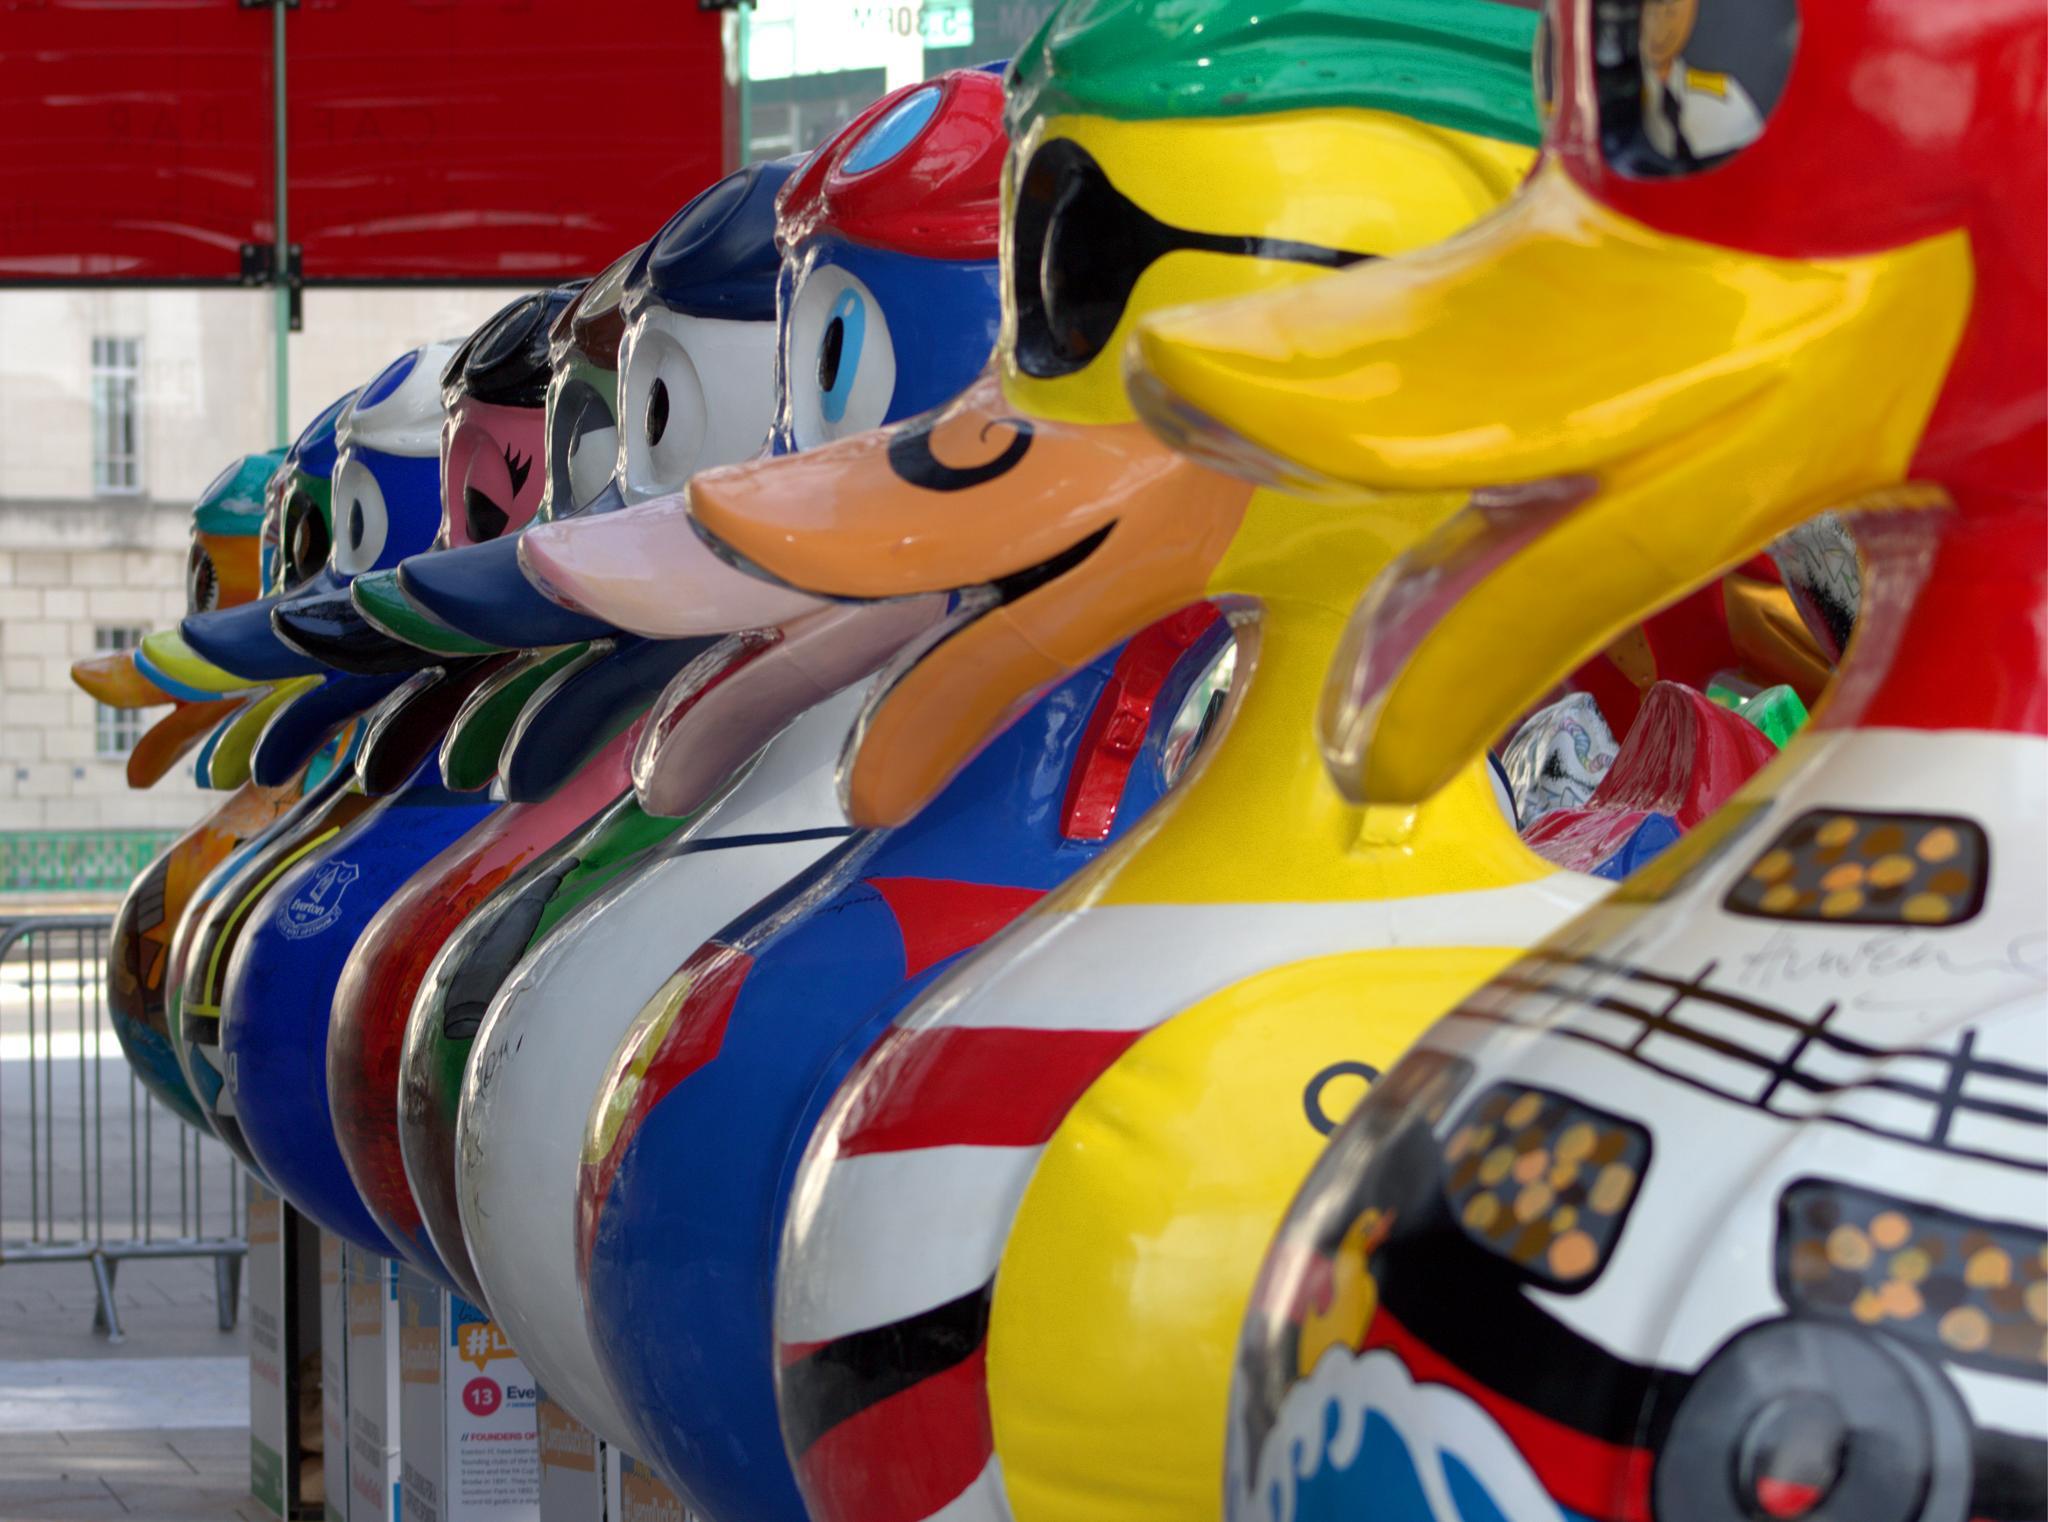 Liverpool DuckTrail - Quack-attention by Marjorie H Morgan